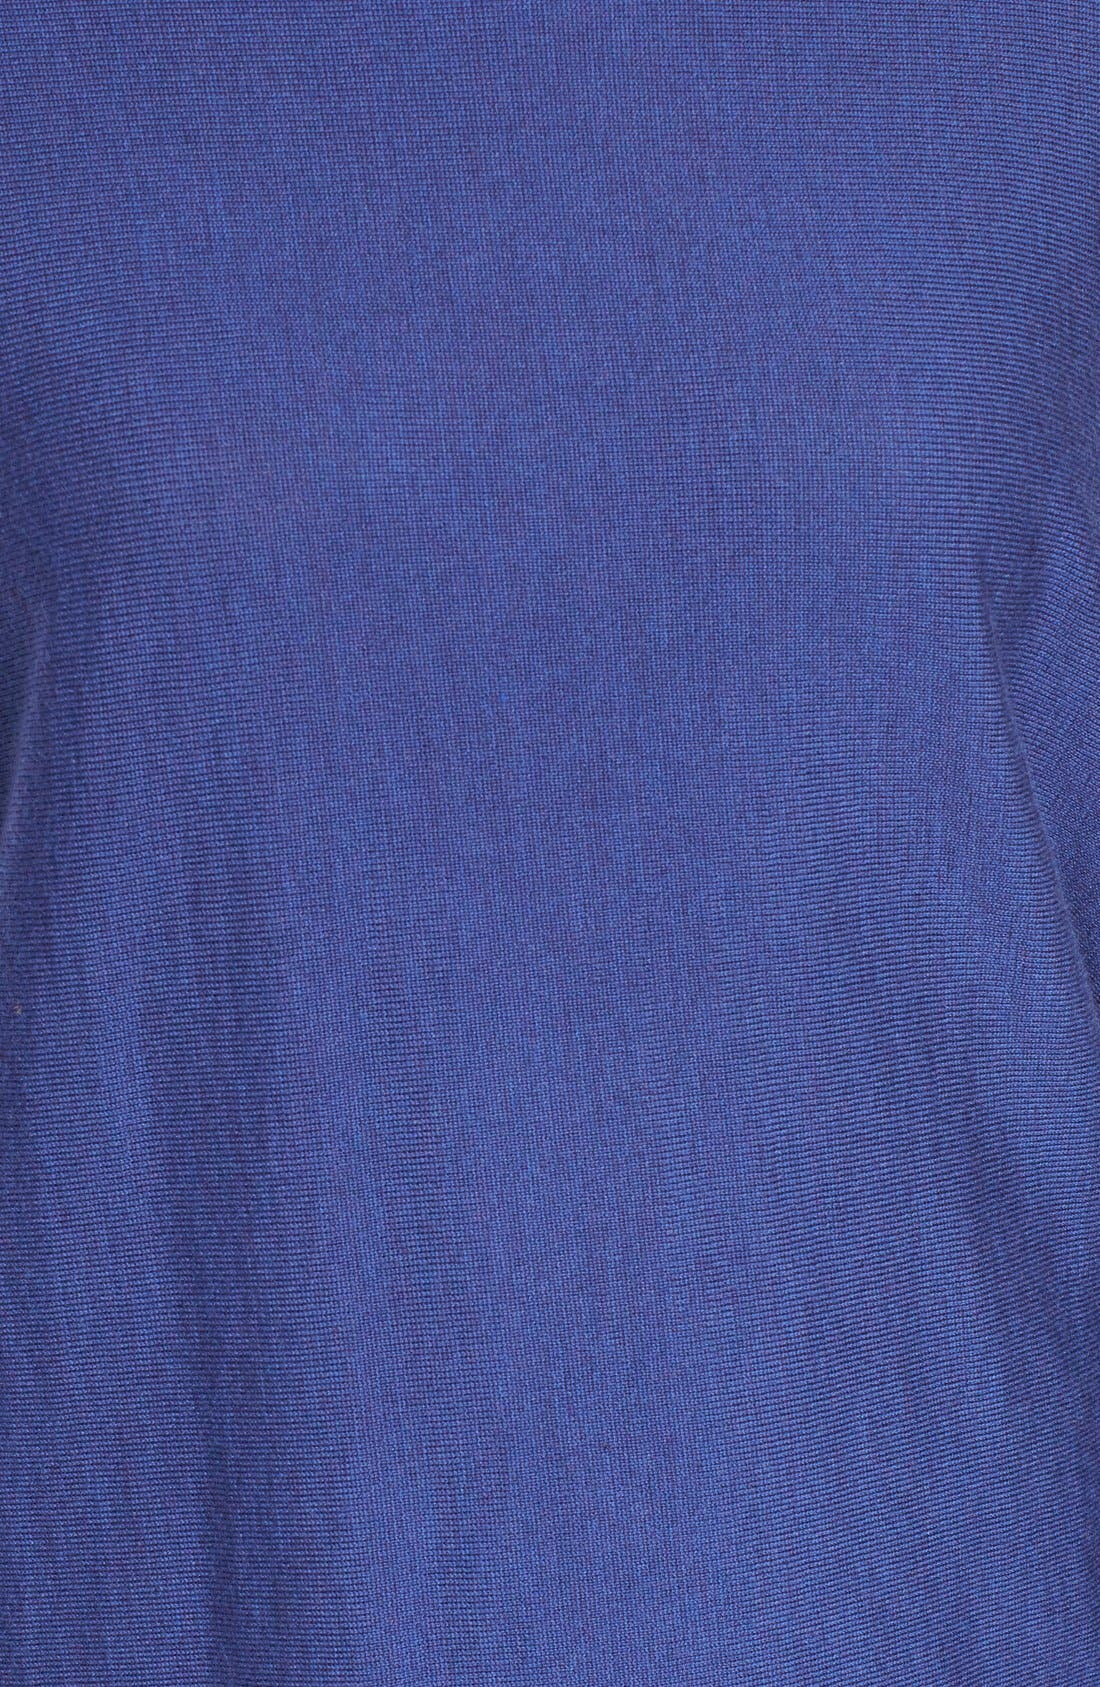 Asymmetrical Merino Jersey Turtleneck,                             Alternate thumbnail 5, color,                             Adriatic